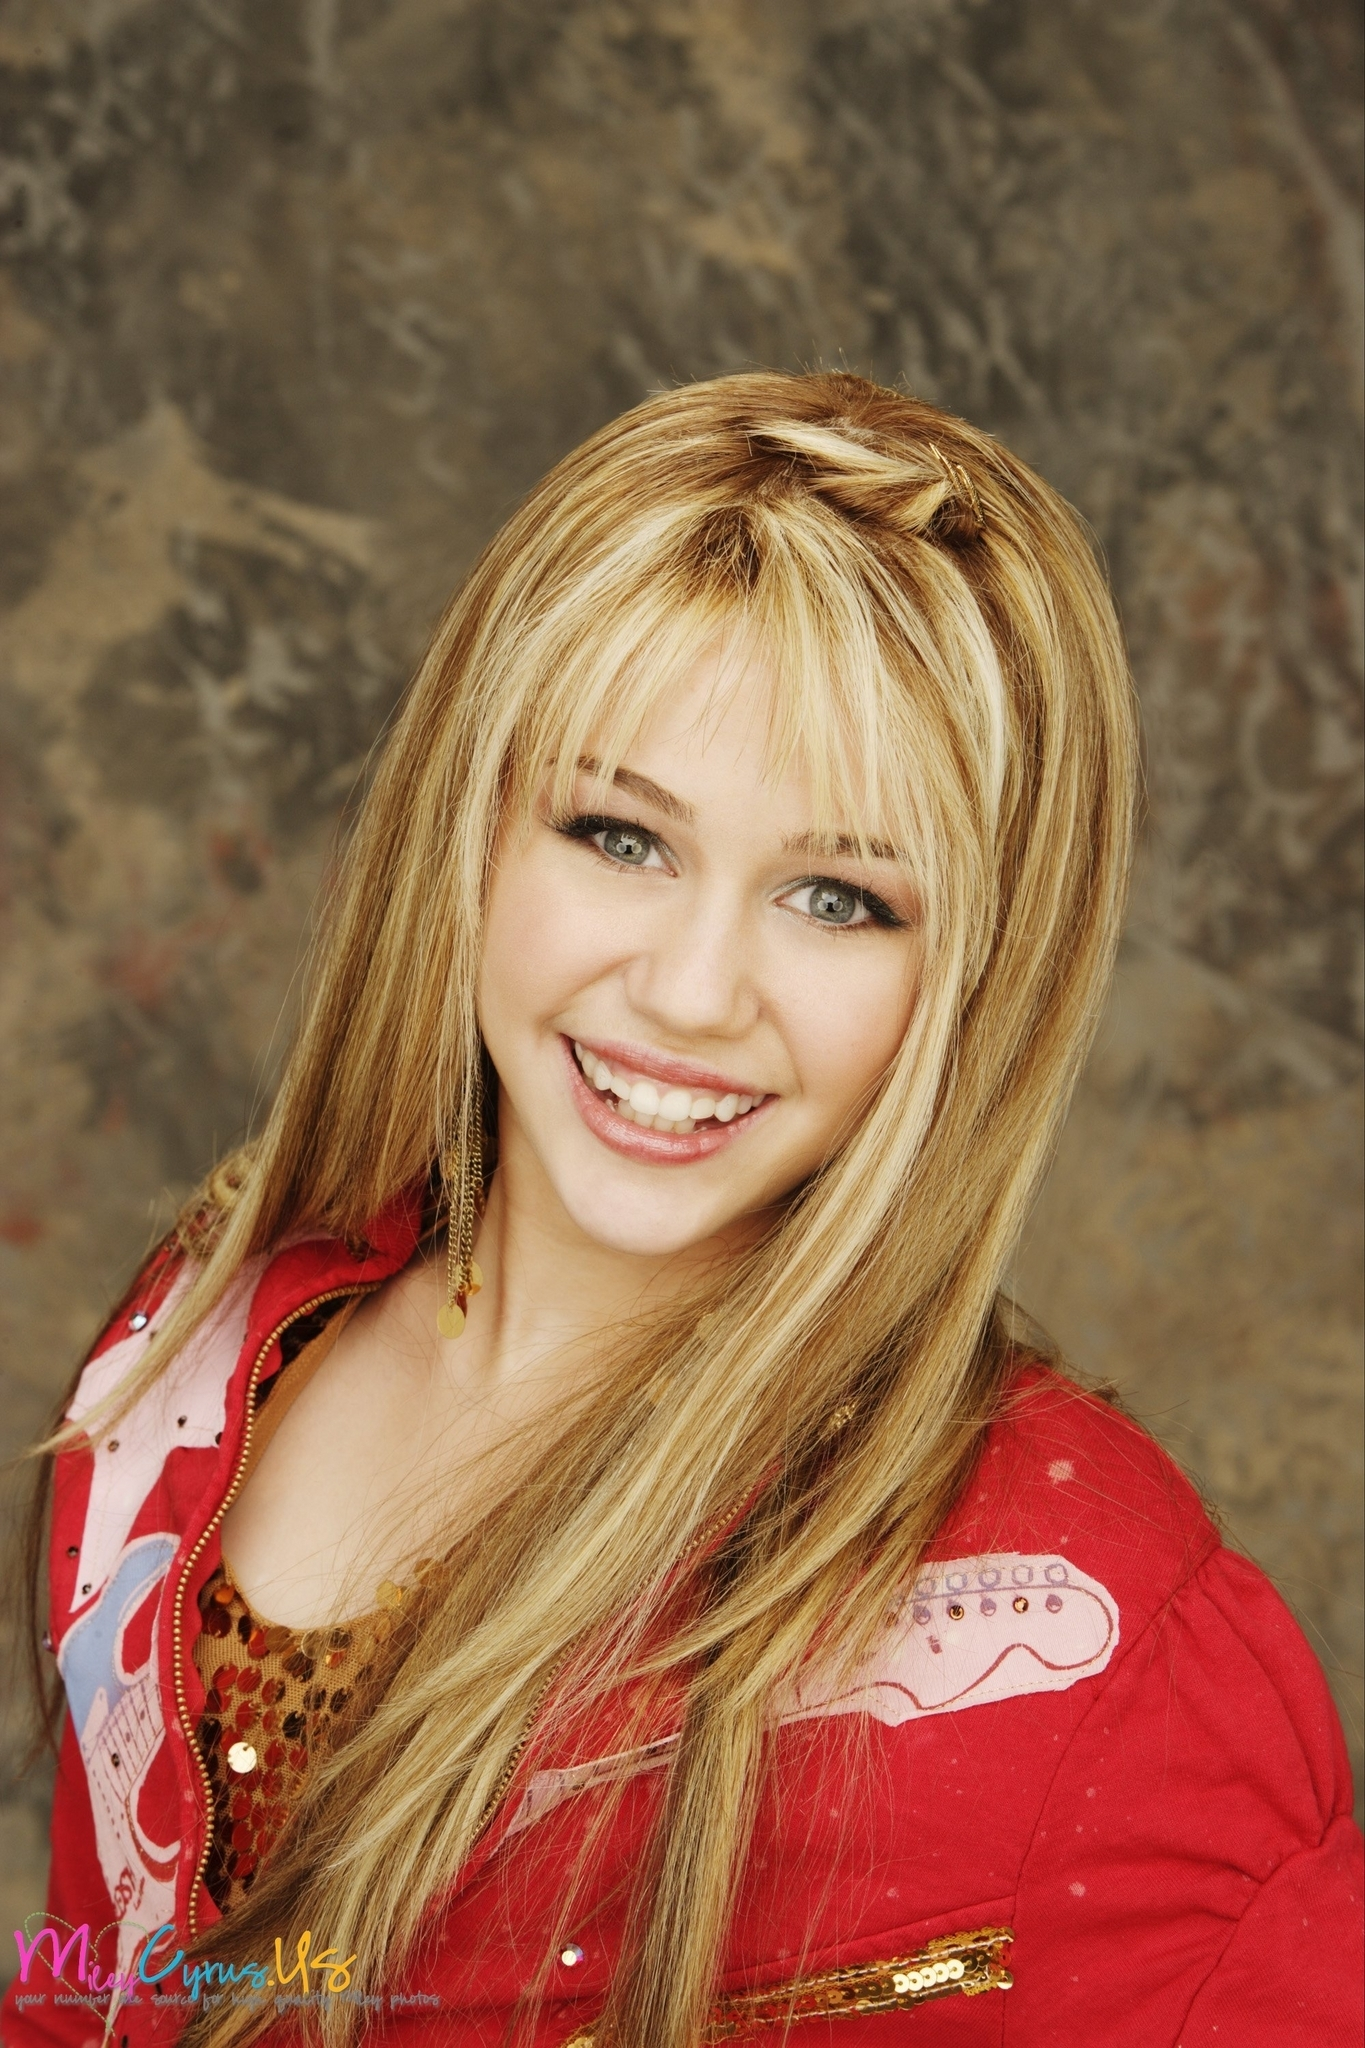 Fotos De Hannah Montana E Seu Namorado Tas Import Tammy Pocket Gratis Hijab Instan Najwa